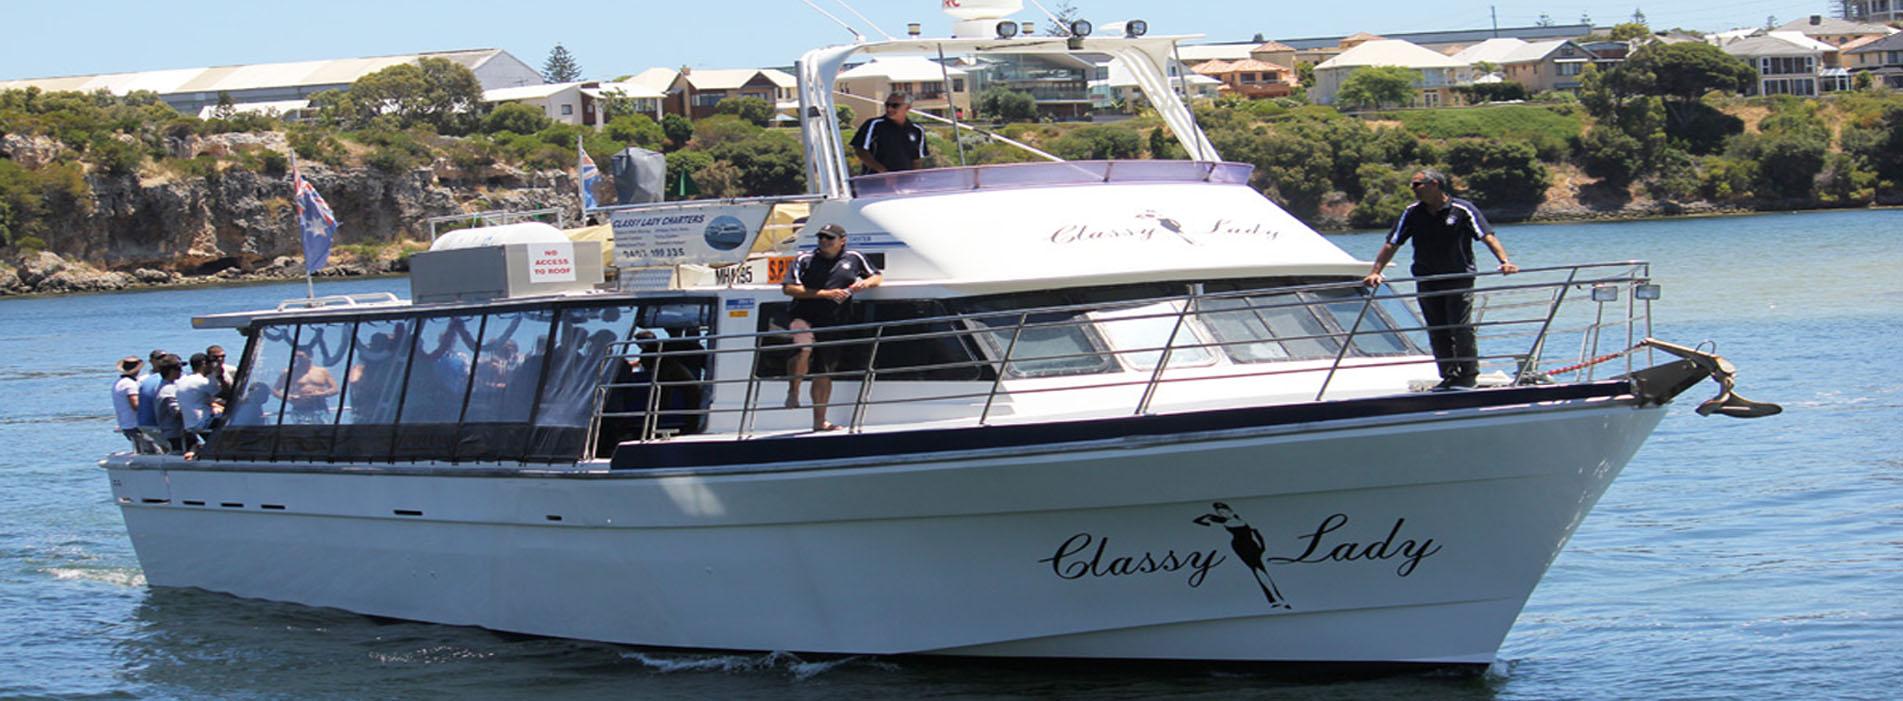 CLASSY LADY side profile boat charter swan river